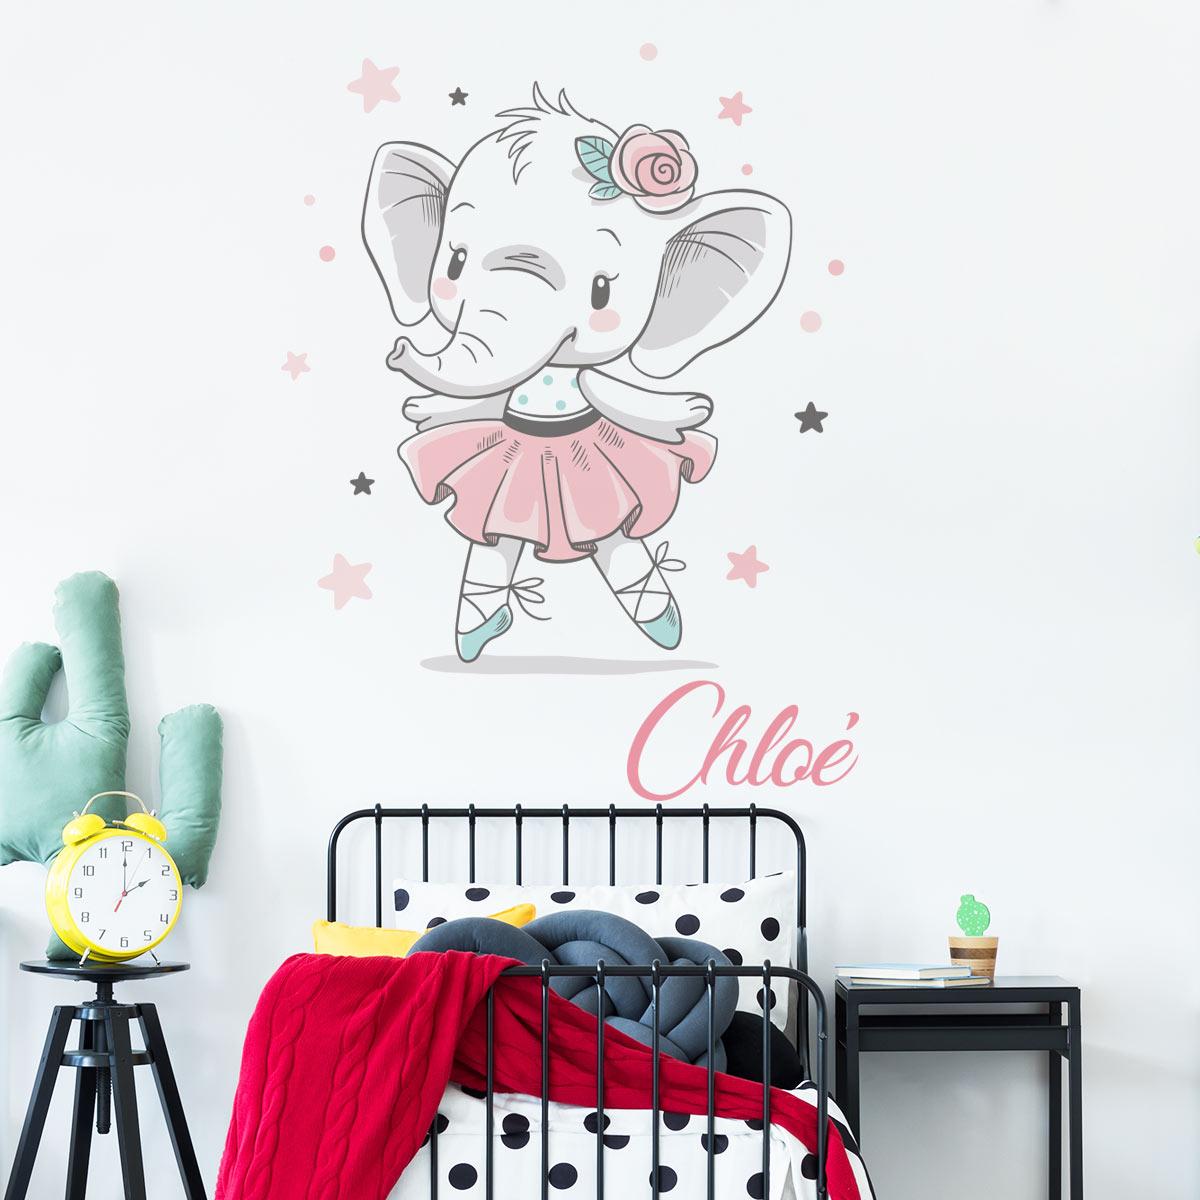 sticker pr nom personnalisable l phant ballerine. Black Bedroom Furniture Sets. Home Design Ideas